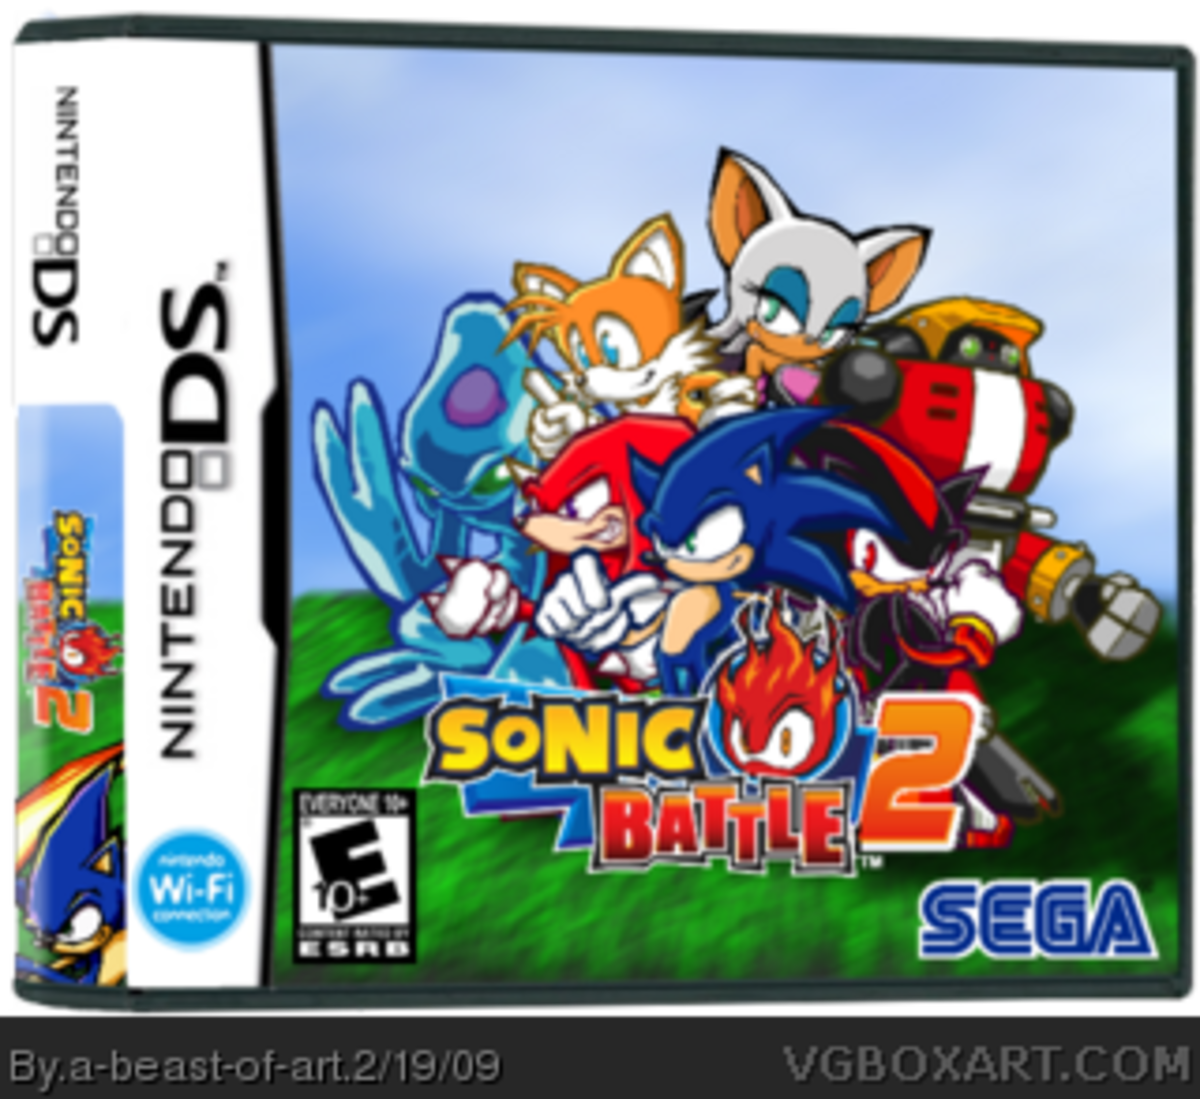 Sonic Battle 2